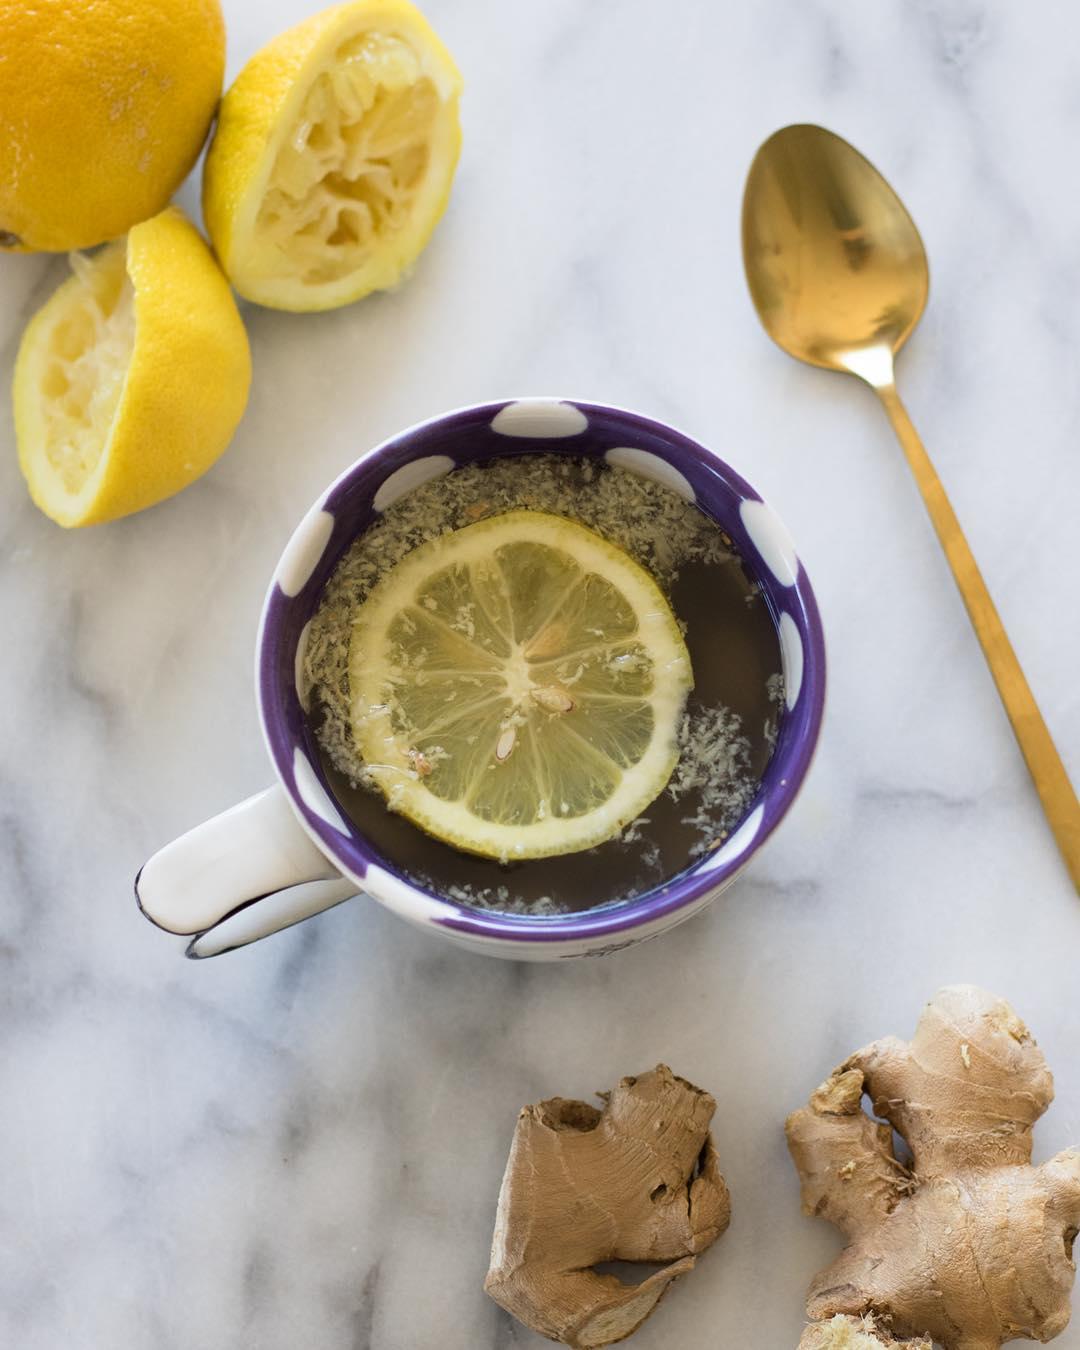 Currently sipping on JOYFETTI DIY sick tea to get ridhellip